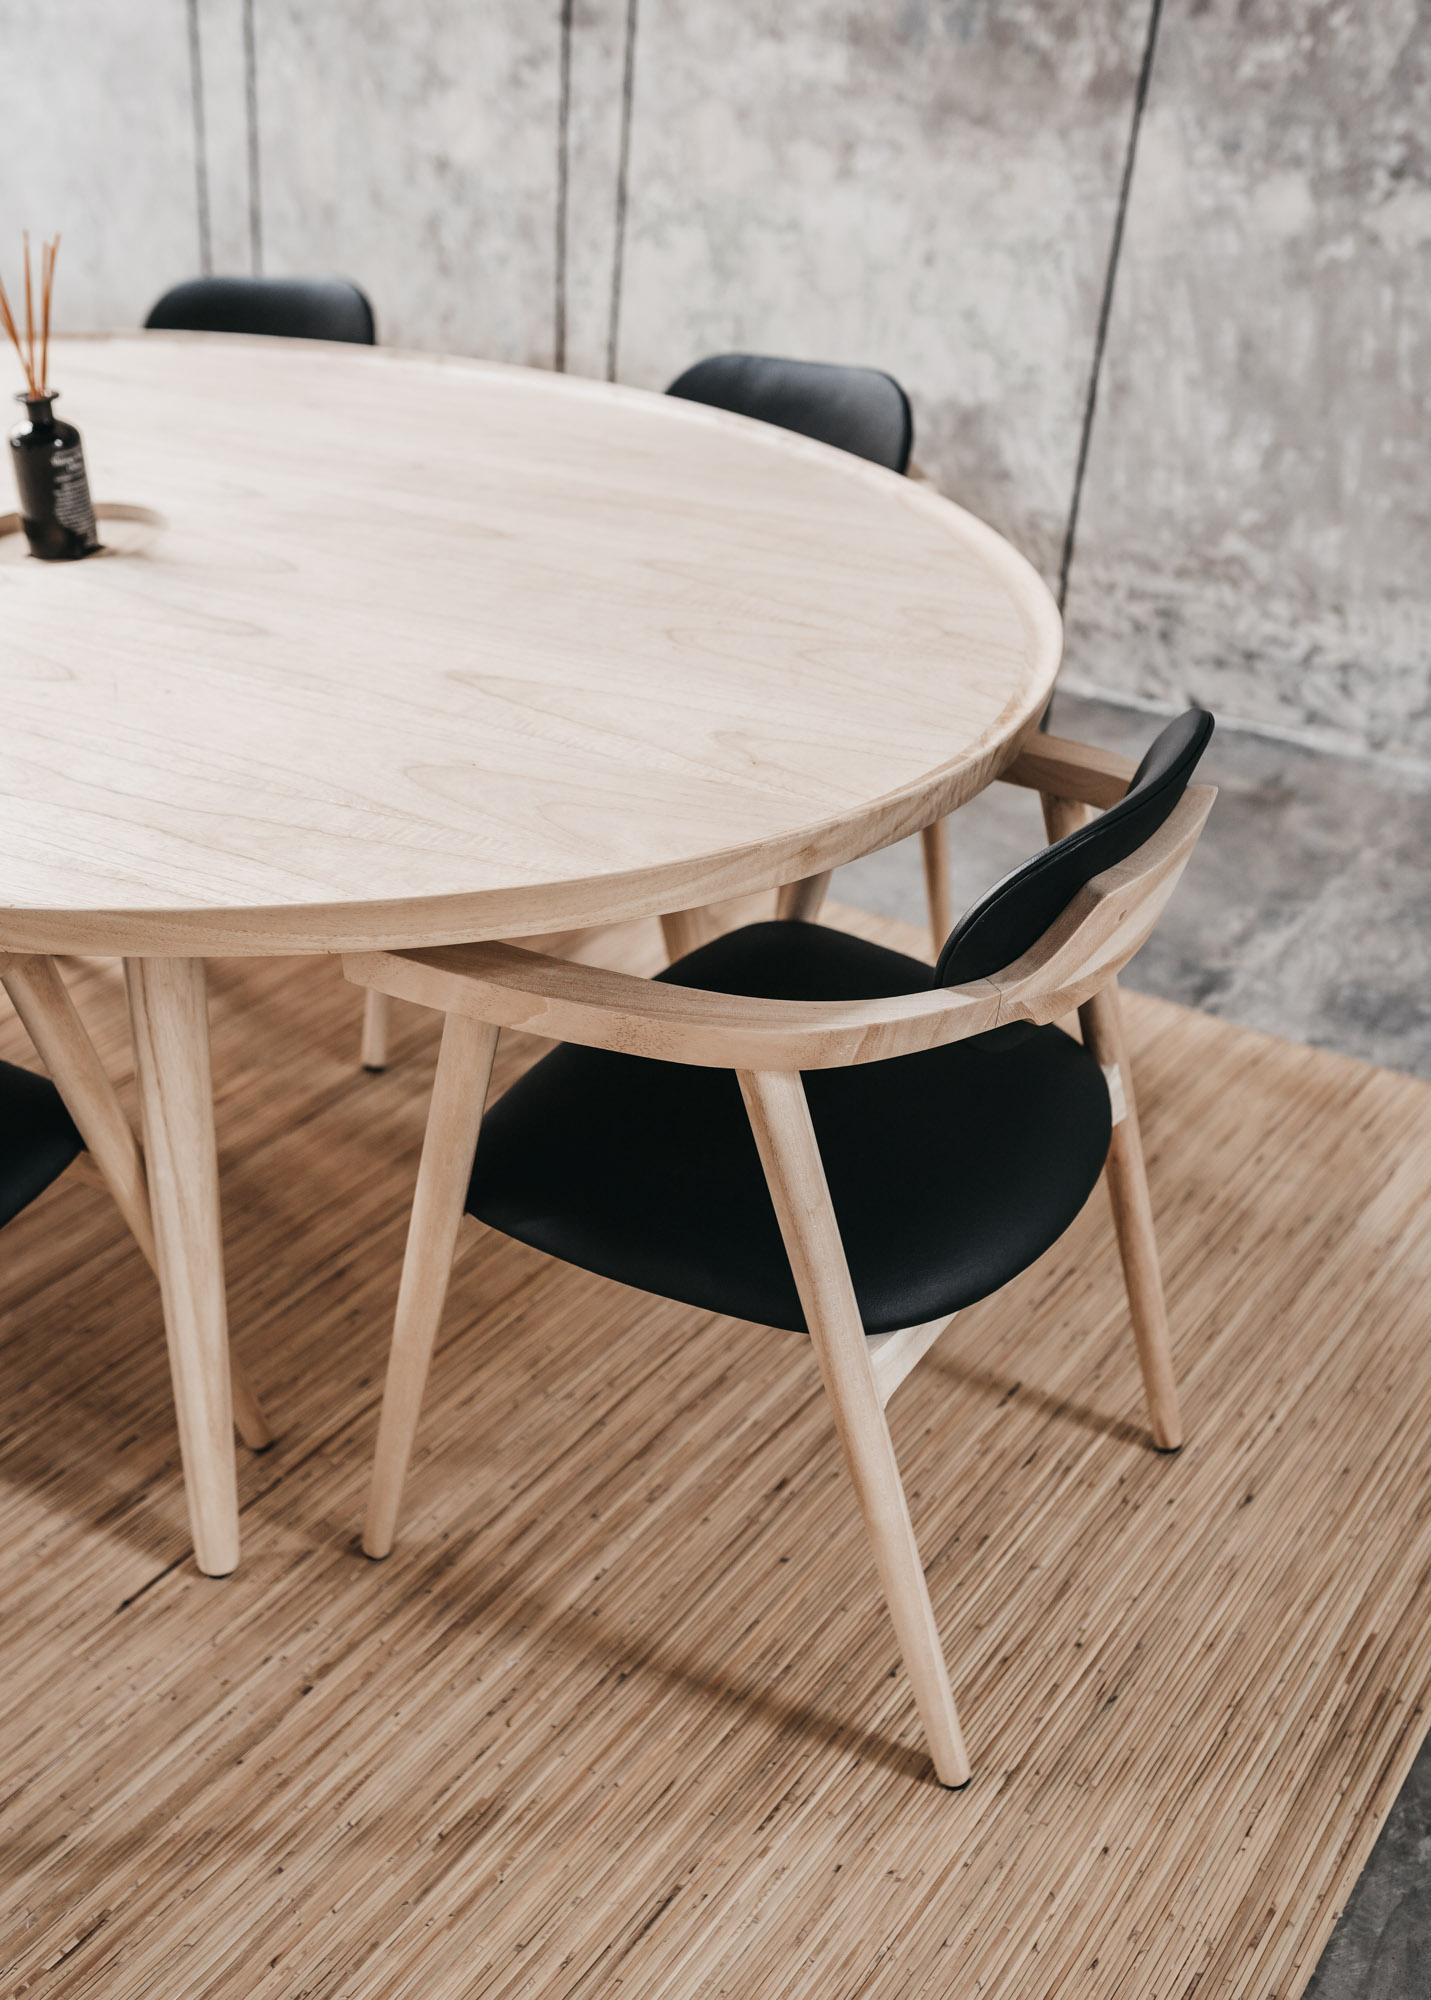 keira-mason-kinship-studio-minimal-furniture.jpg